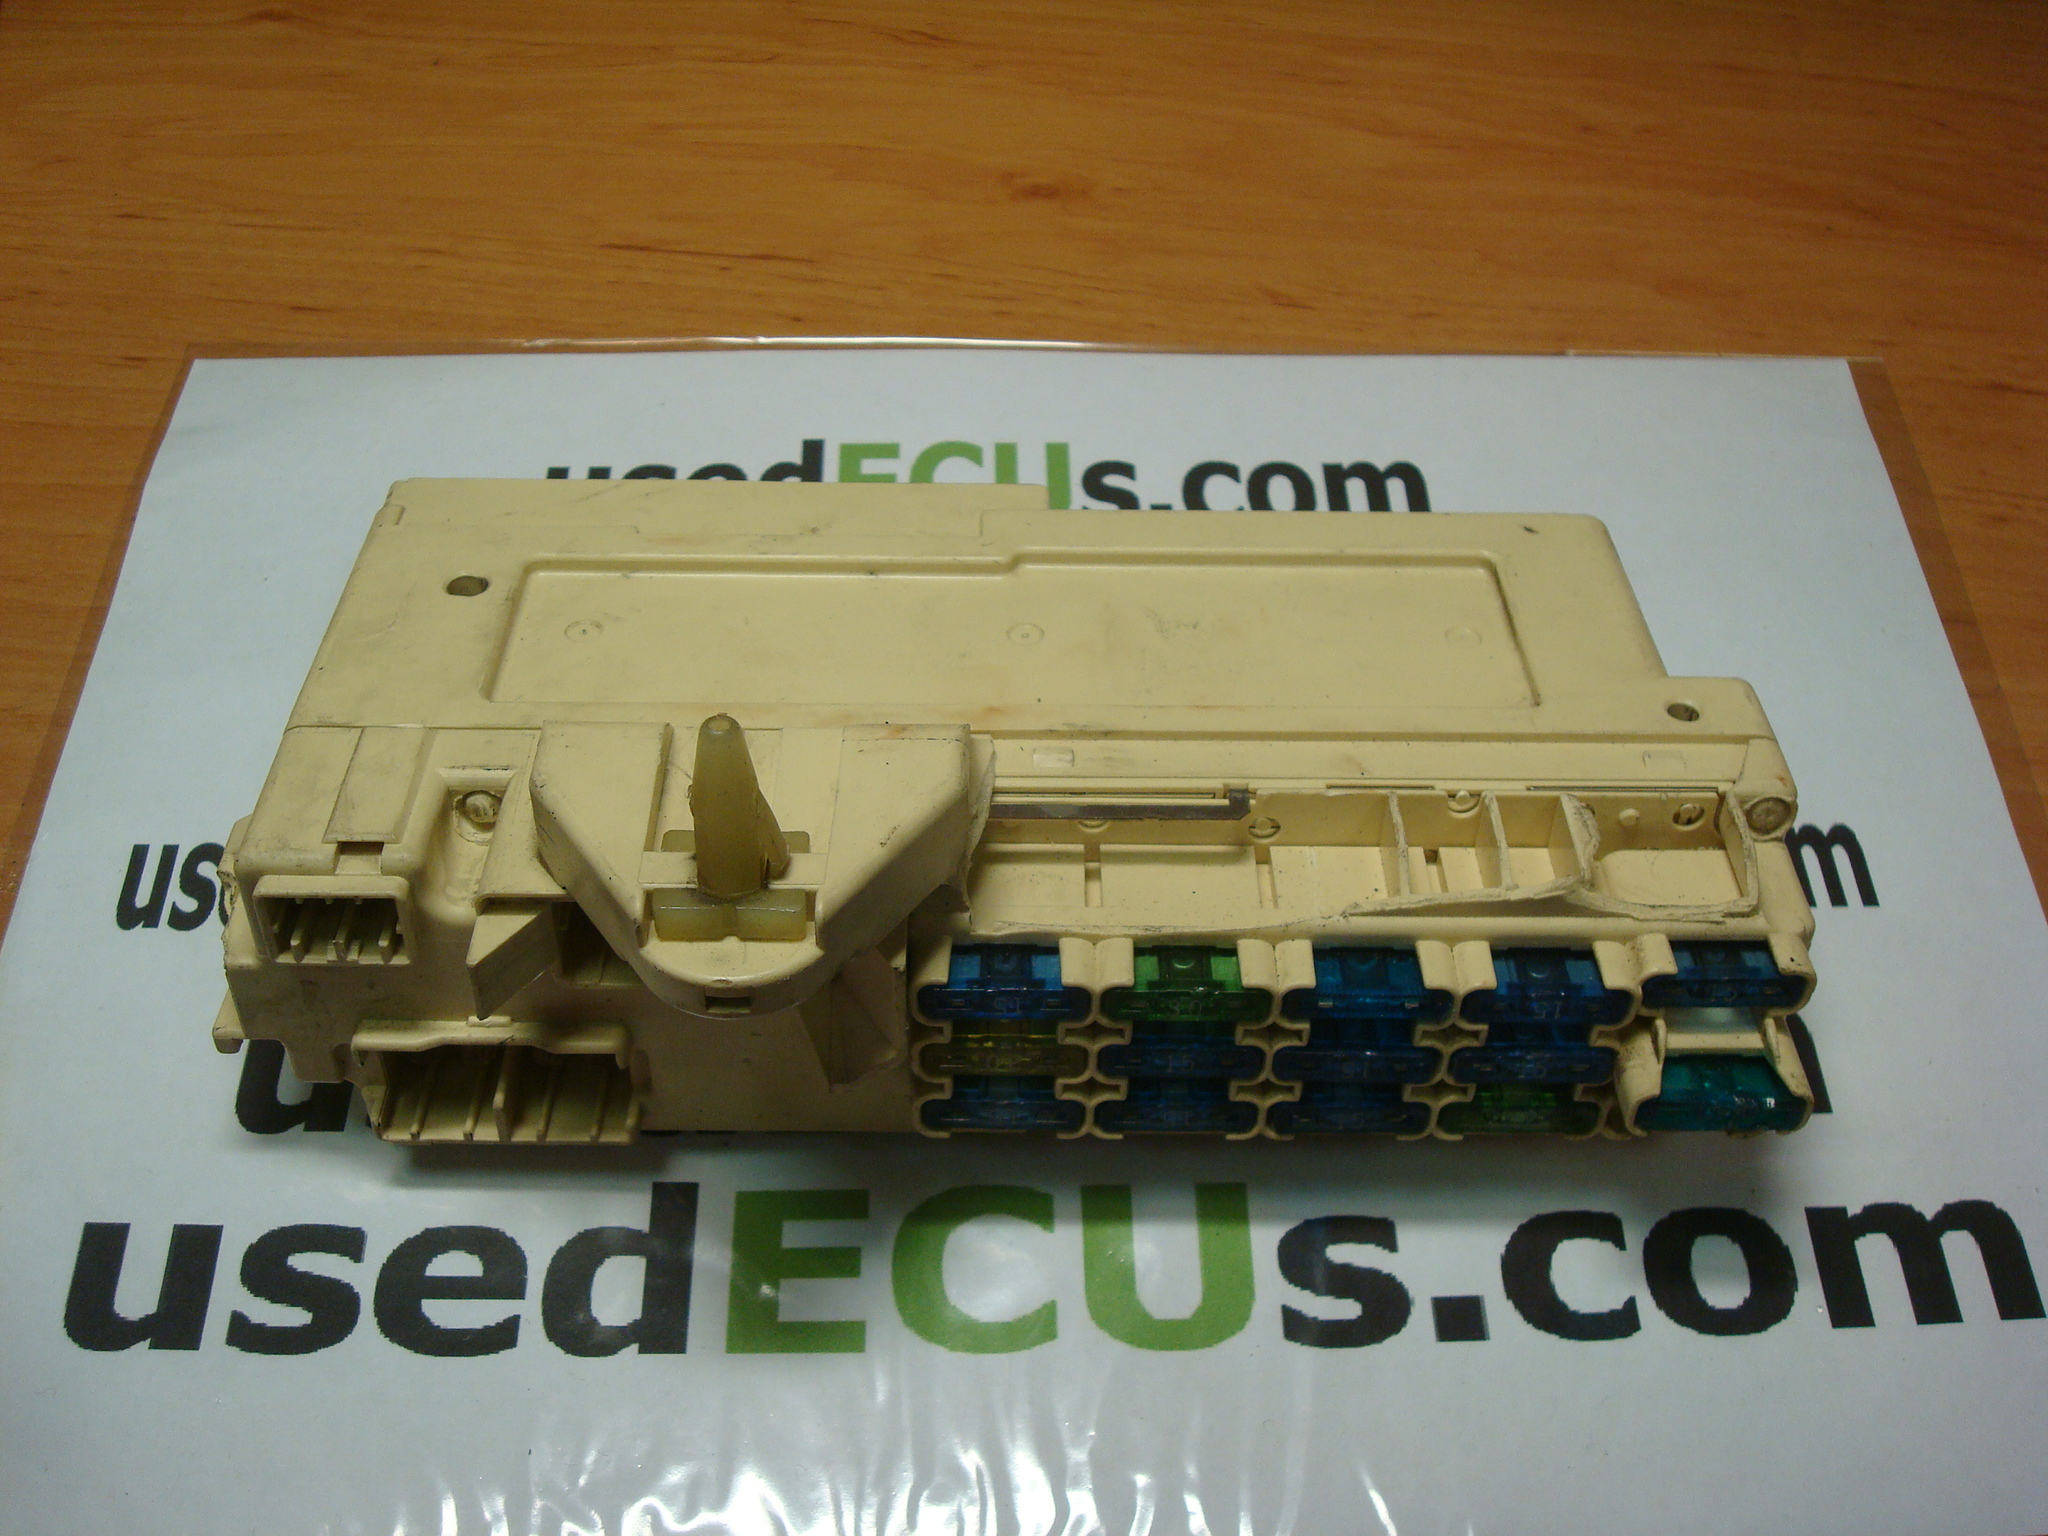 ford probe, 1996, 2,5 petrol, fuse box, ecu, 0112 78 7.12.6 - usedecus.com  catalog - usedecus.com